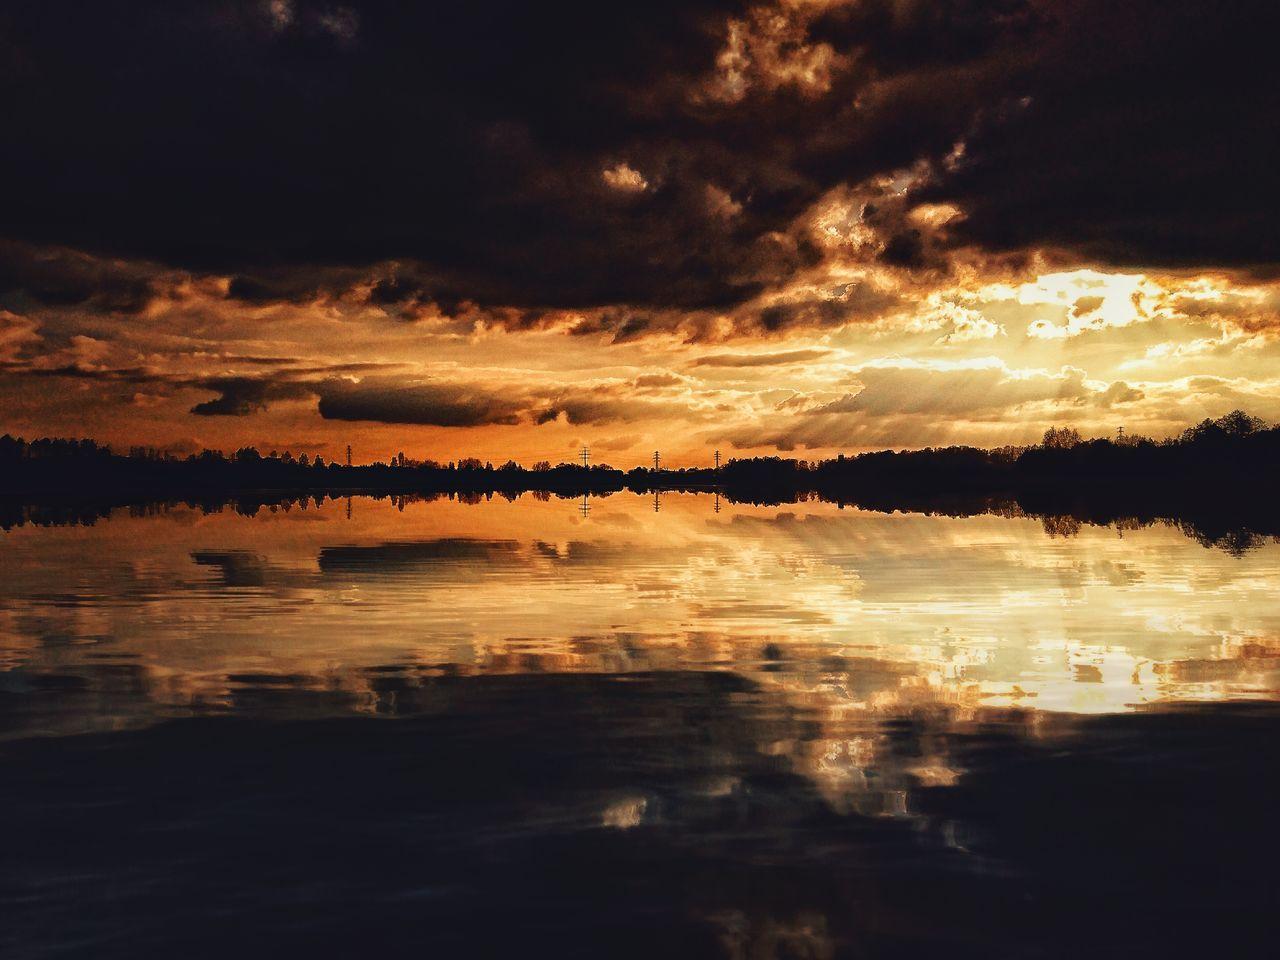 Reflection Lake Water Sunset Nature Tranquil Scene Scenics Outdoors No People Tranquility Sky Beauty In Nature Landscape Zachodslonca Poland Warmia Polska Poland Olsztyn Jezioro The Great Outdoors - 2017 EyeEm Awards